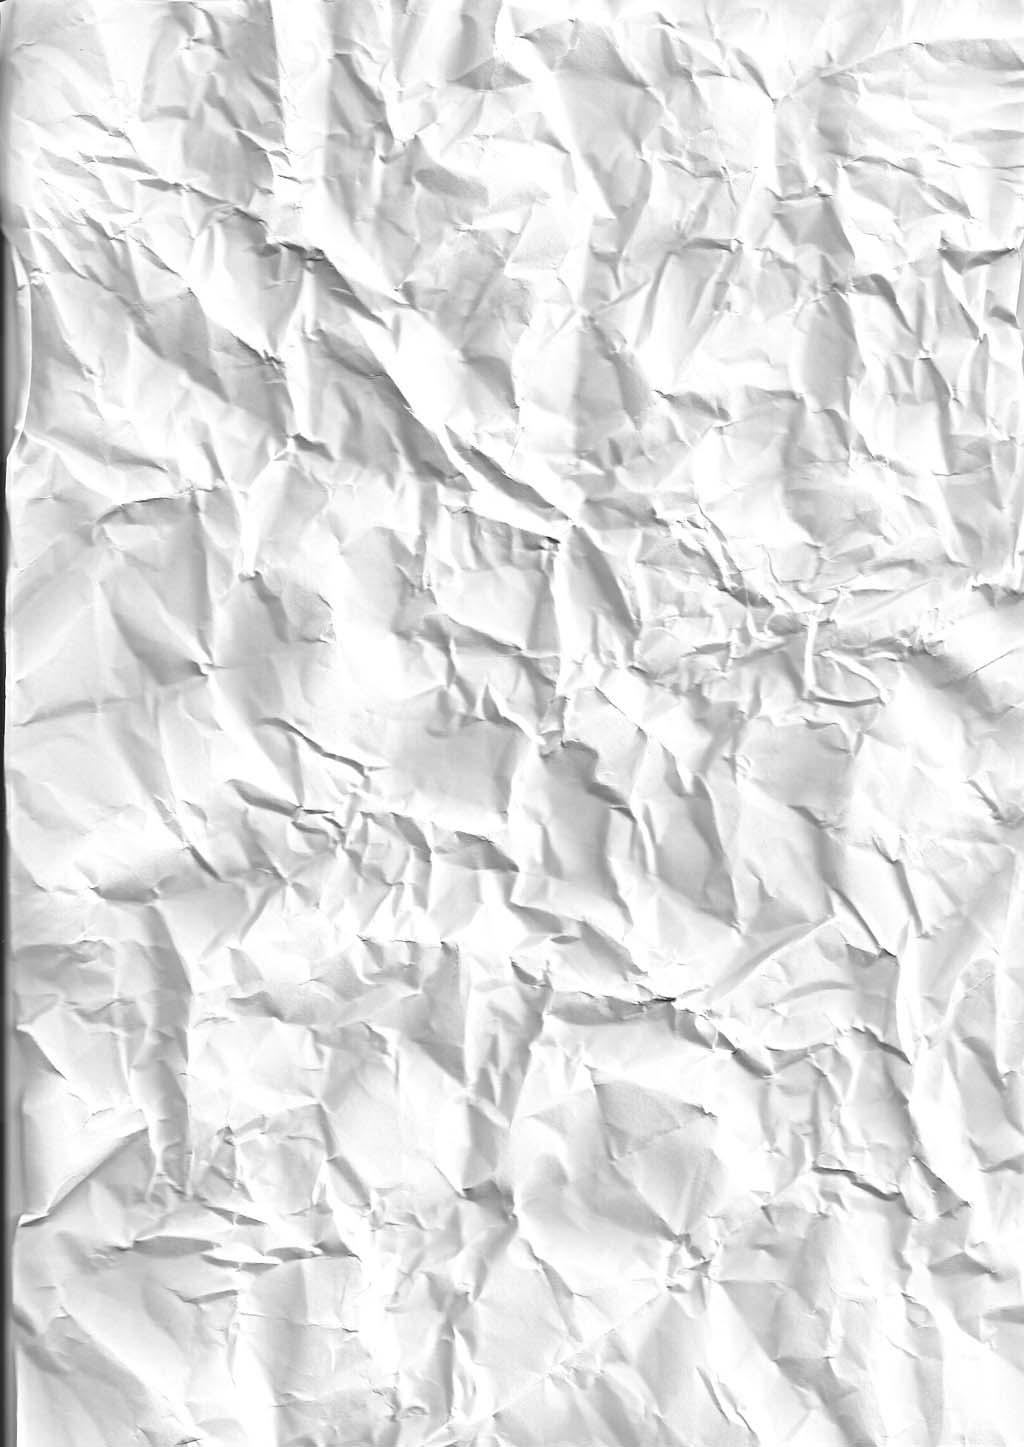 Crumpled Paper Texture by Lil-Plunkie on DeviantArt